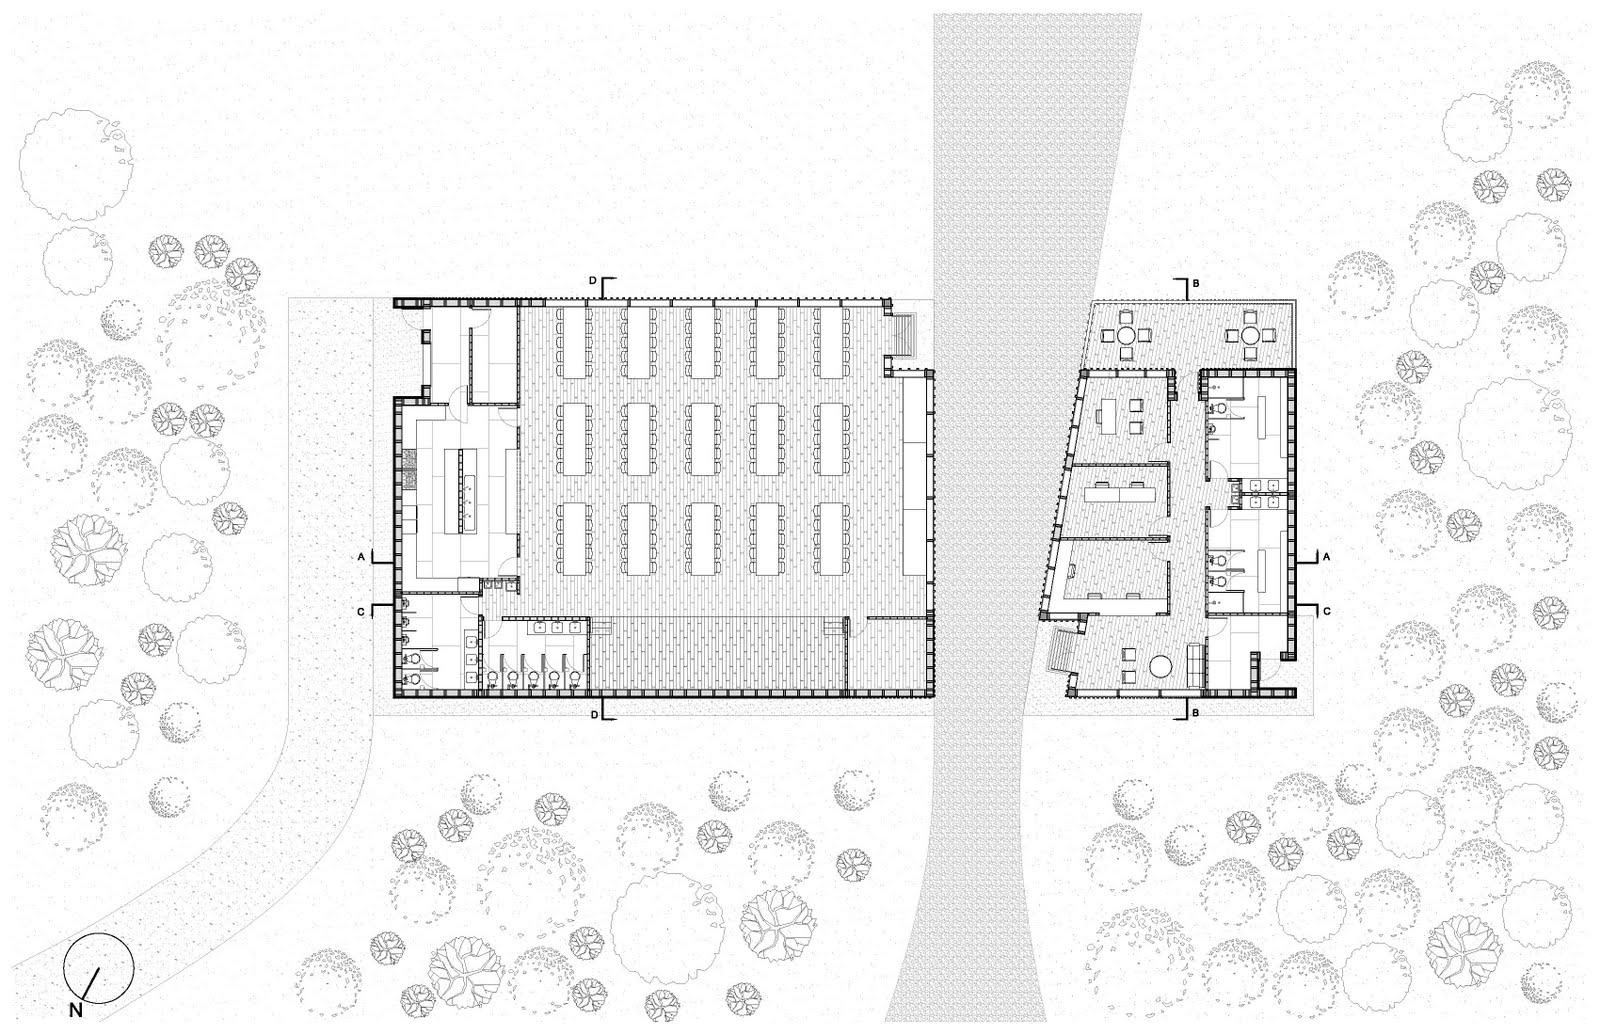 Pavilion Plans Plans Diy Free Download Teds 16000